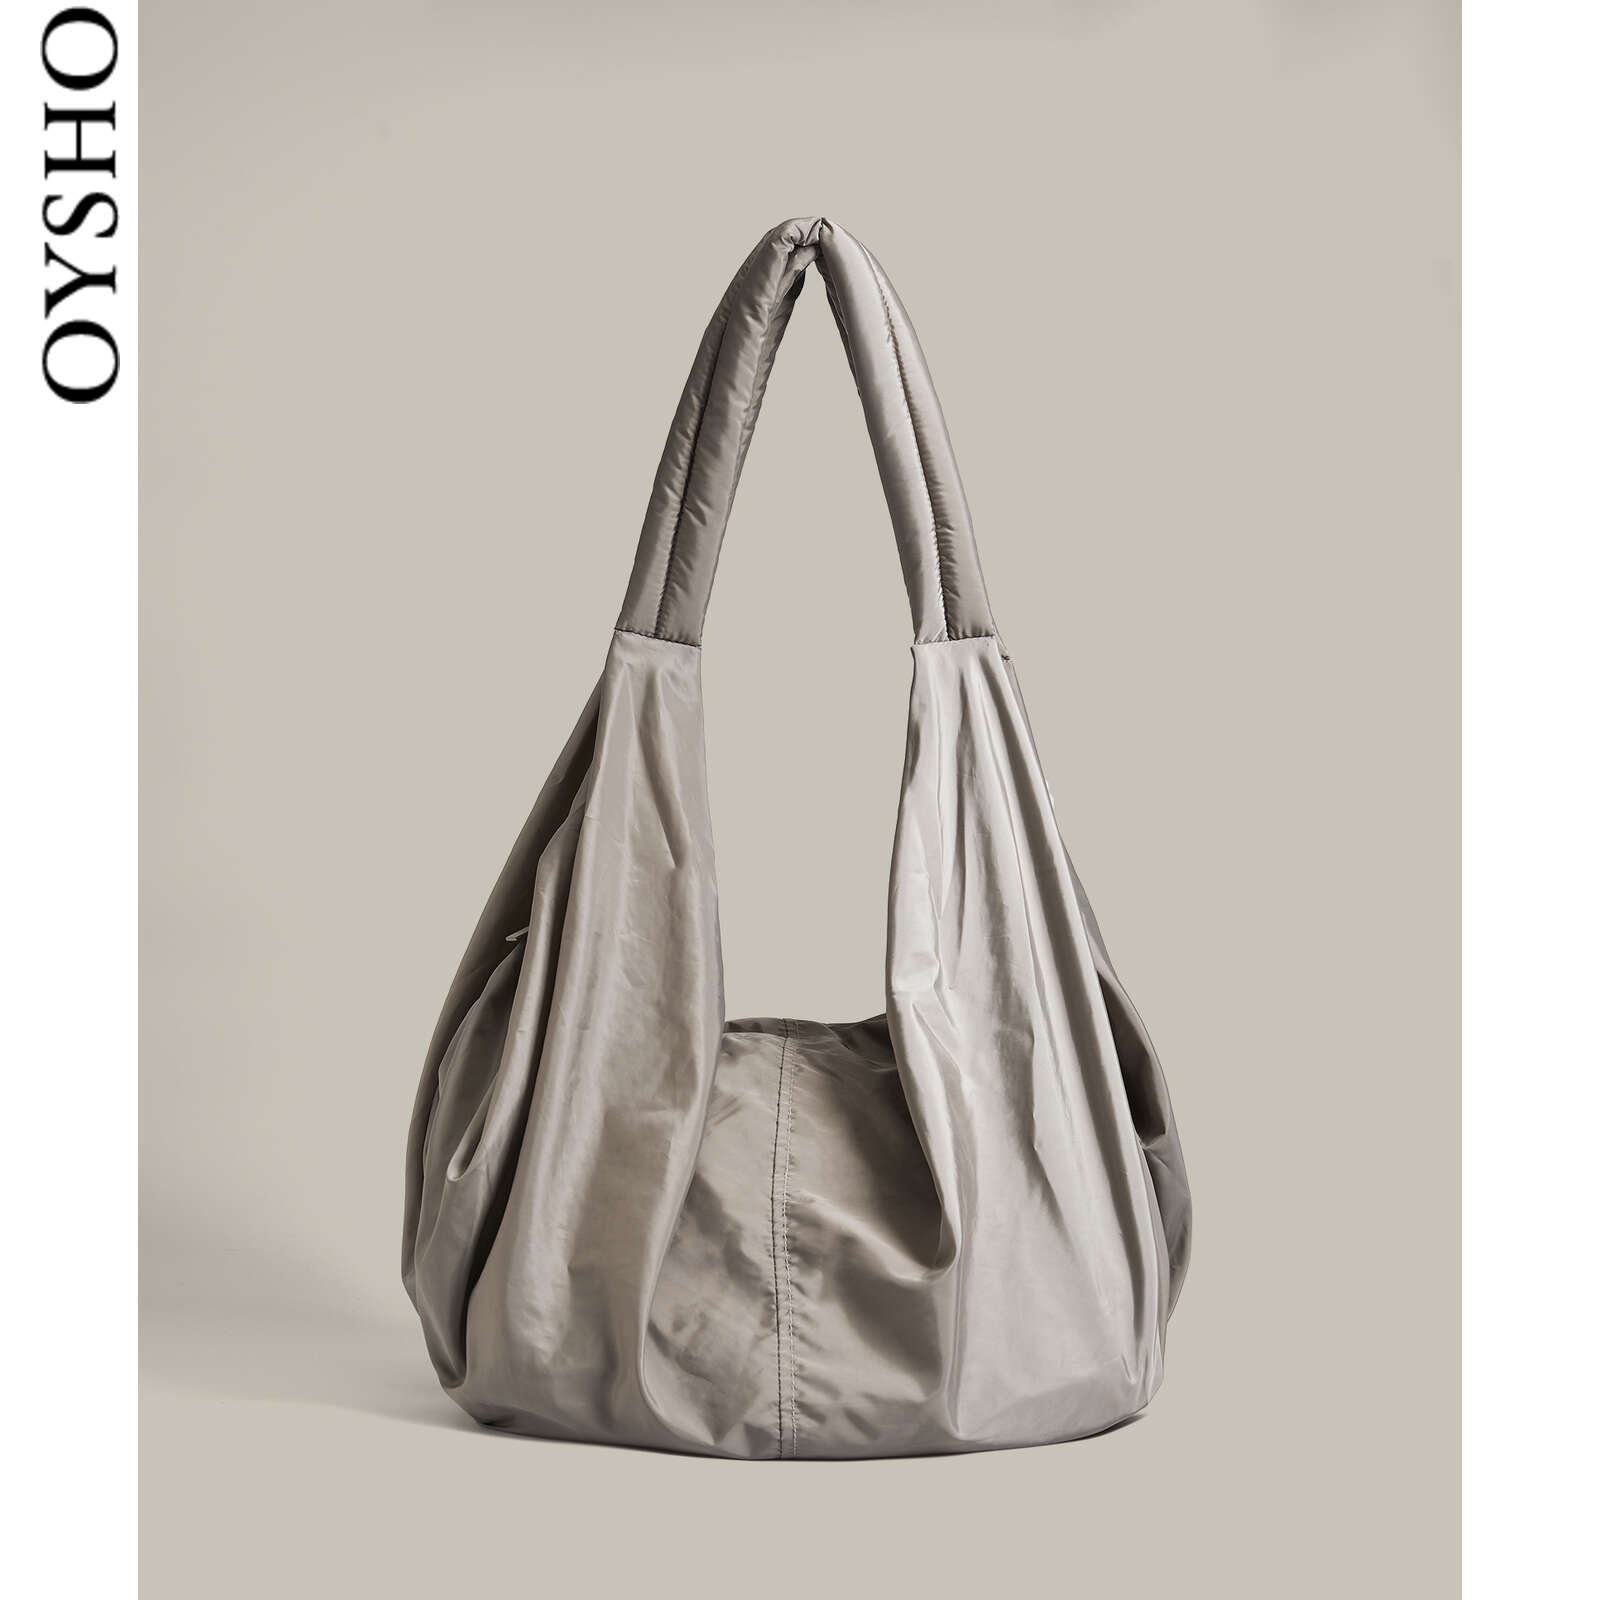 Oysho grey casual sports bag fitness travel bag handbag one-shoulder bag girl 14120780085